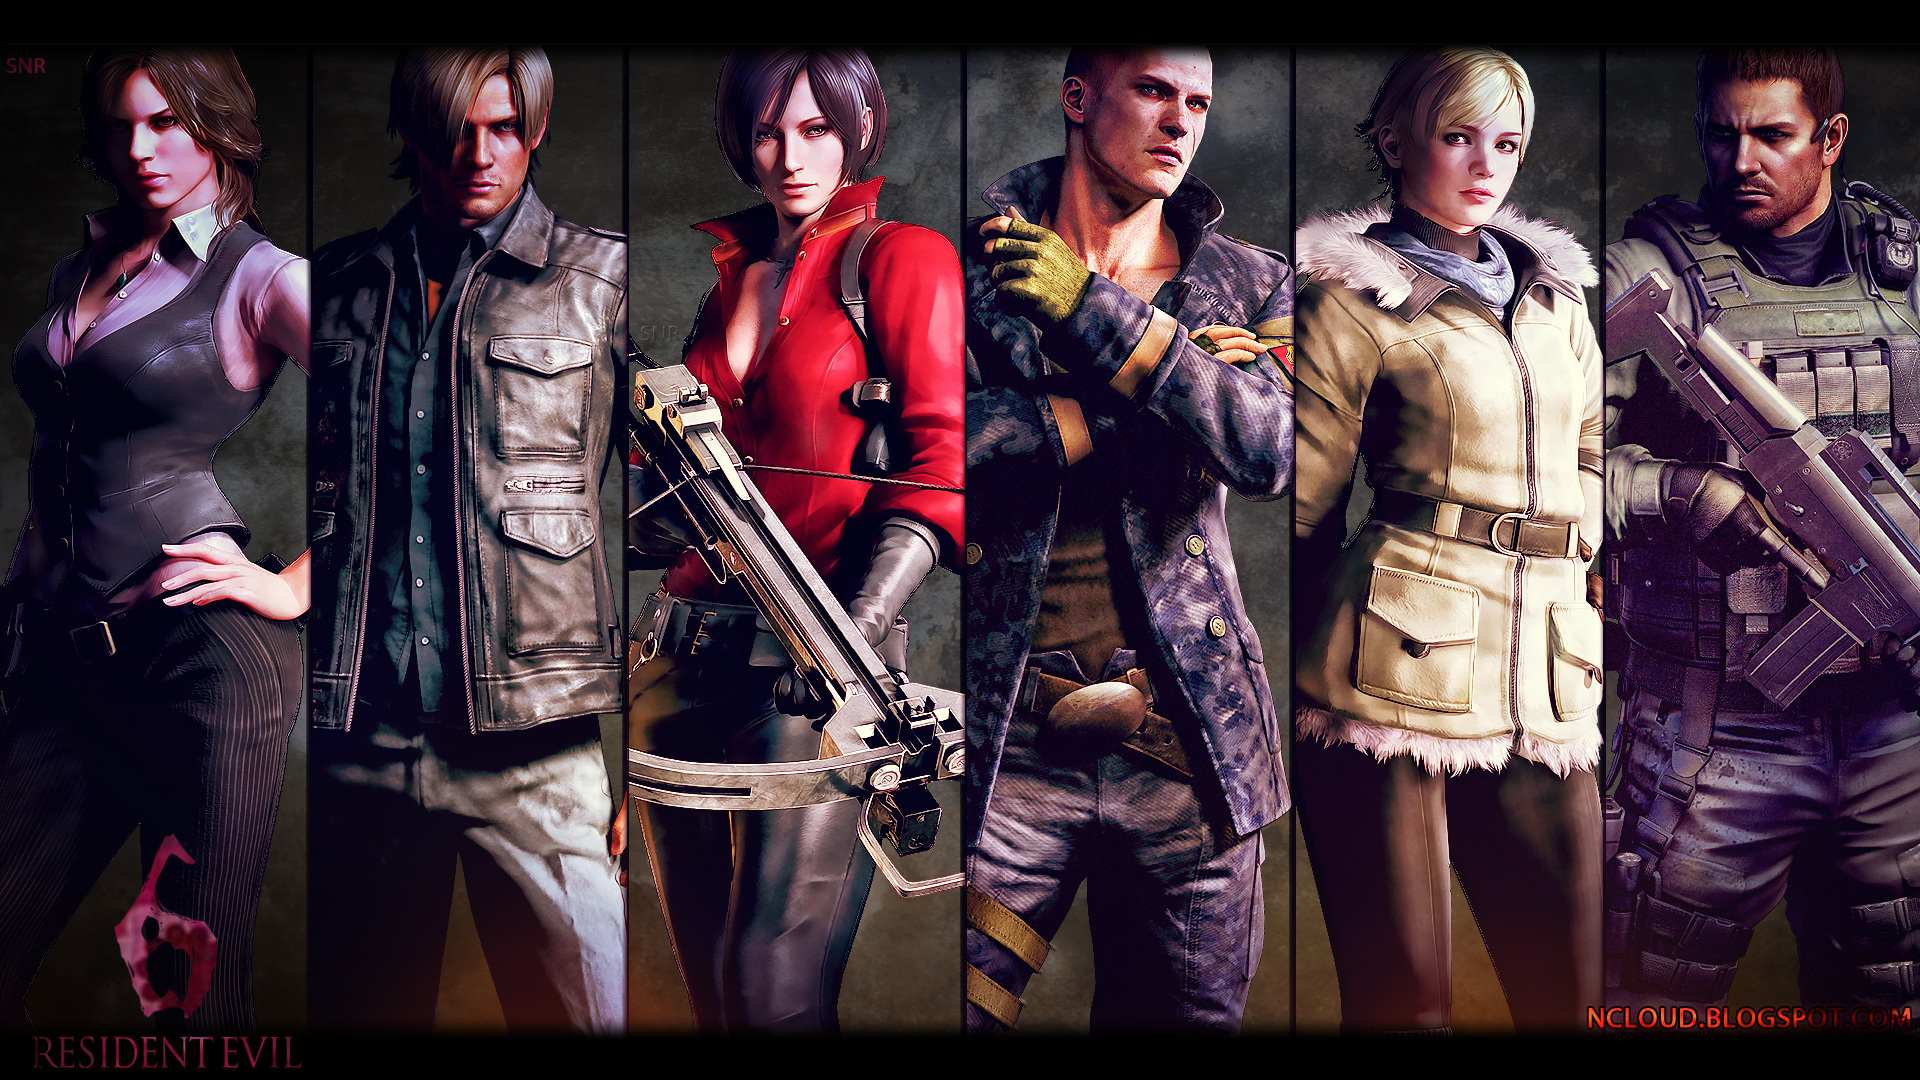 Resident Evil 6 Wallpapers Wallpaper Cave